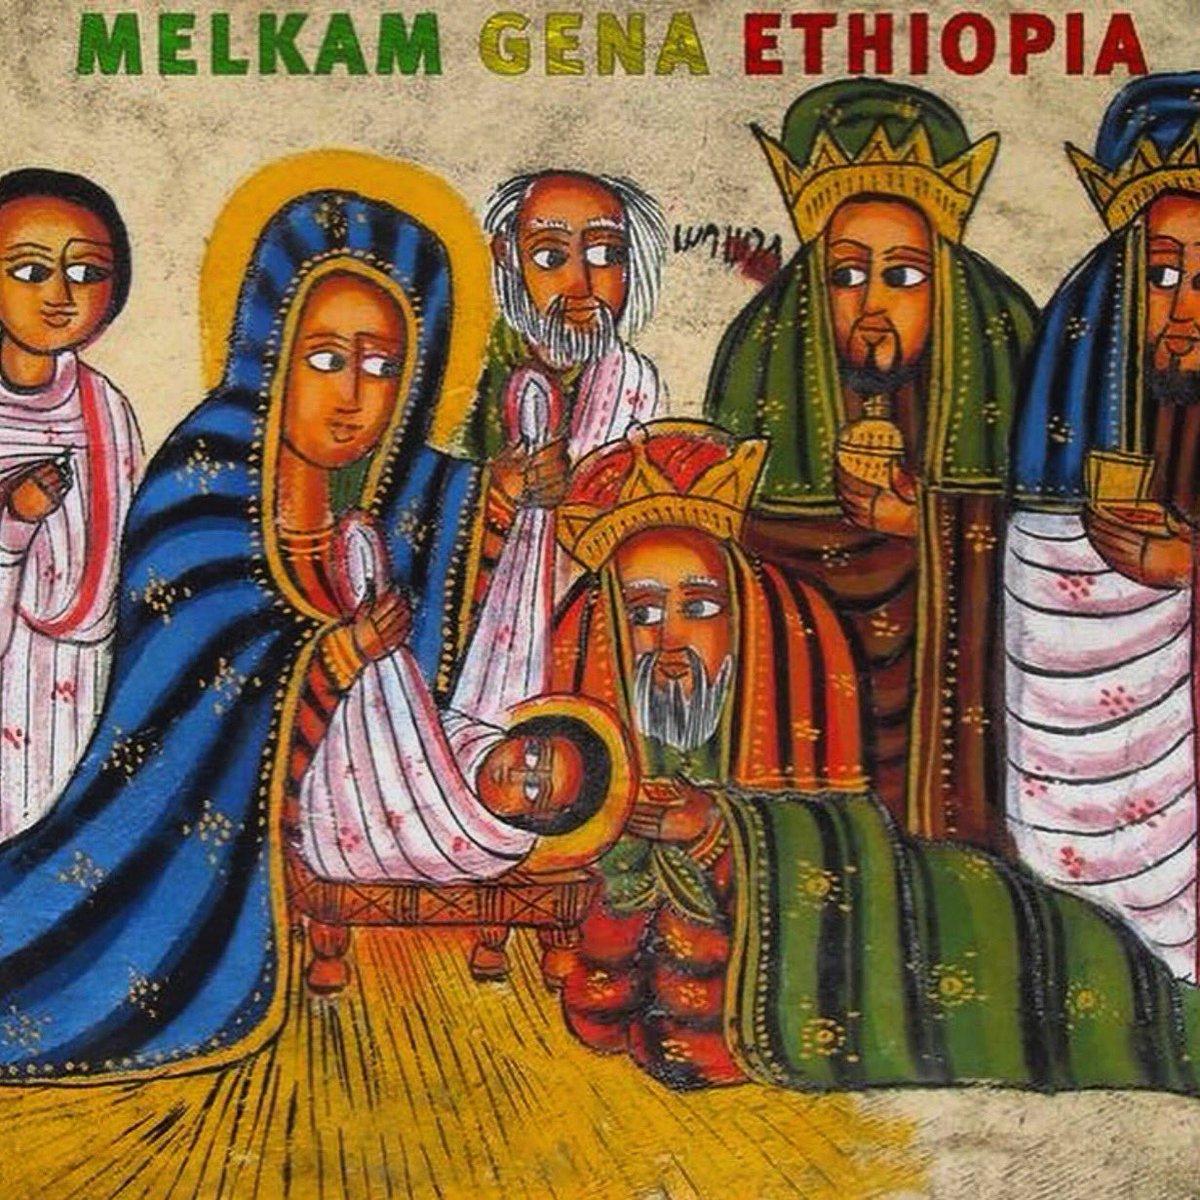 calgary run for water on twitter melkam gena and happy ethiopian christmas melkamgena melkamgenna ethiopianchristmas ethiopia ethiopianorthodox - When Is Ethiopian Christmas